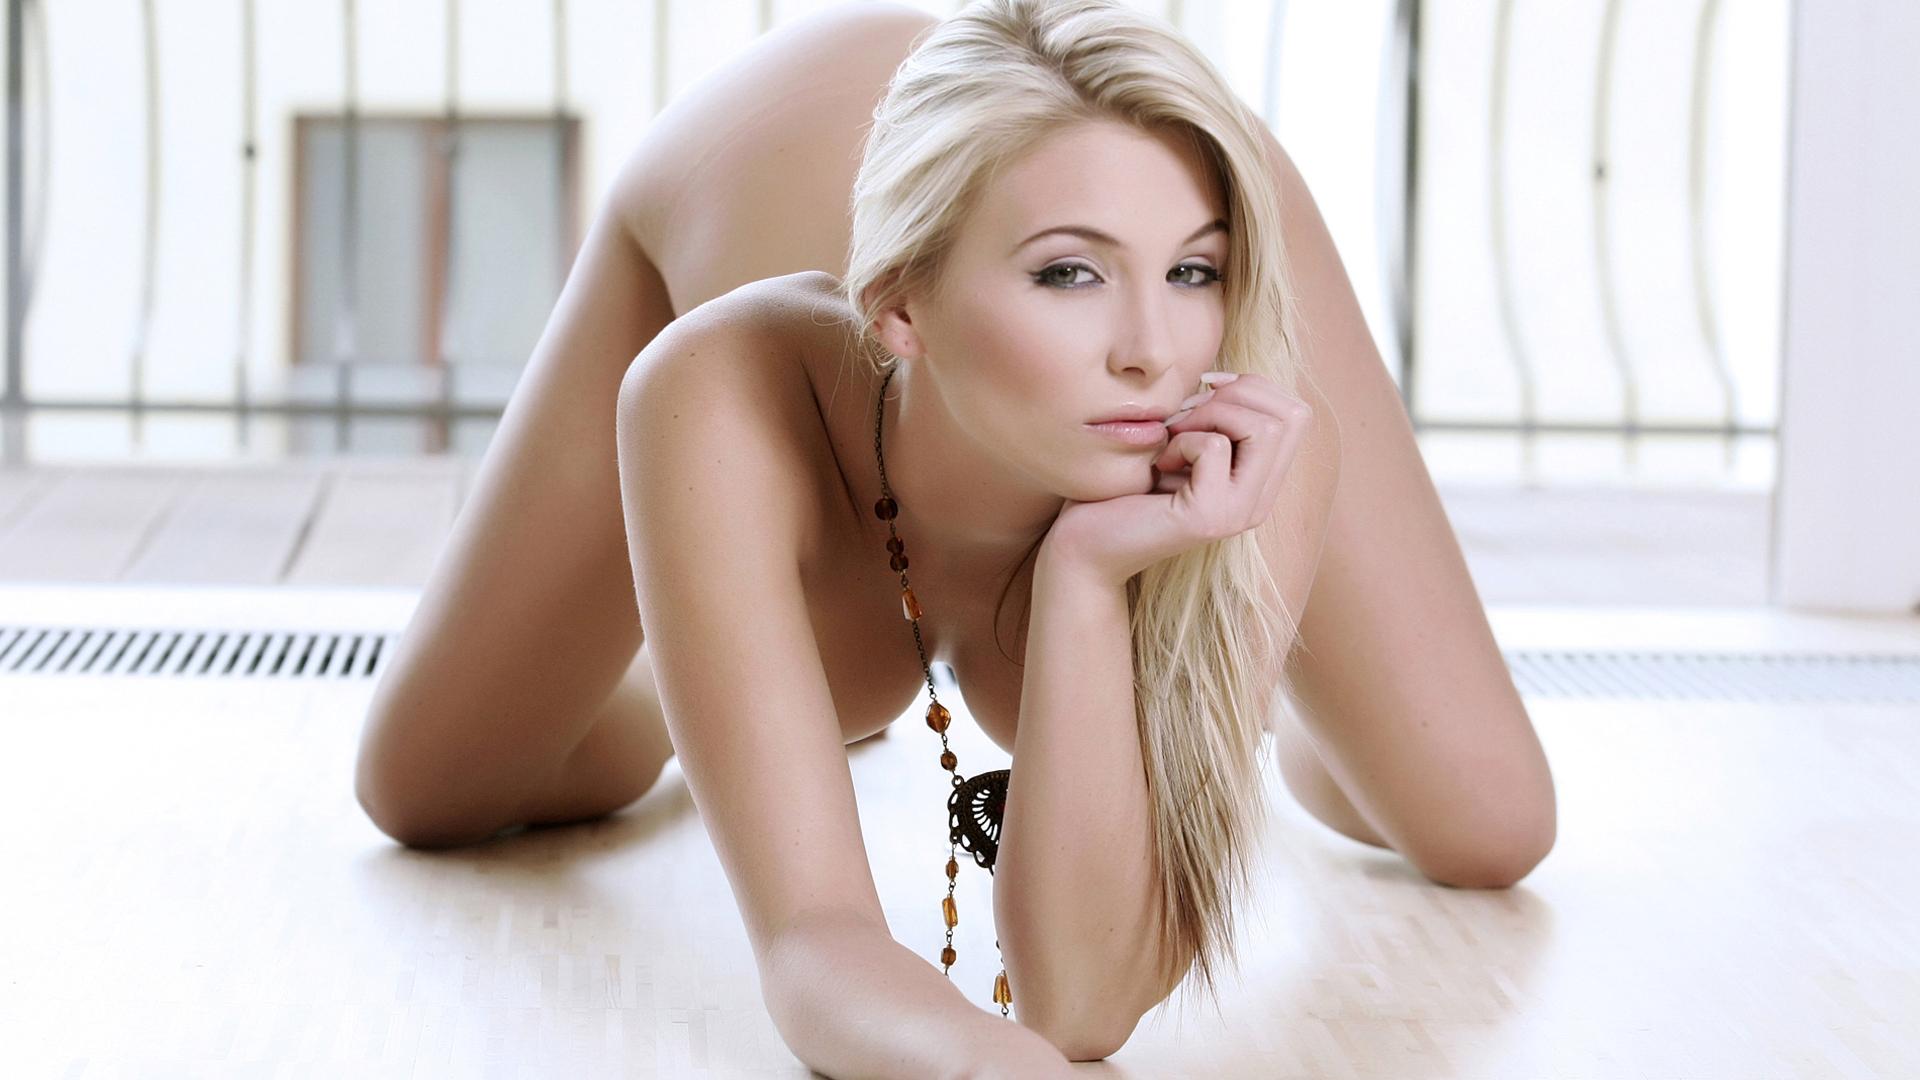 Pornsites wallpaper naked online slut